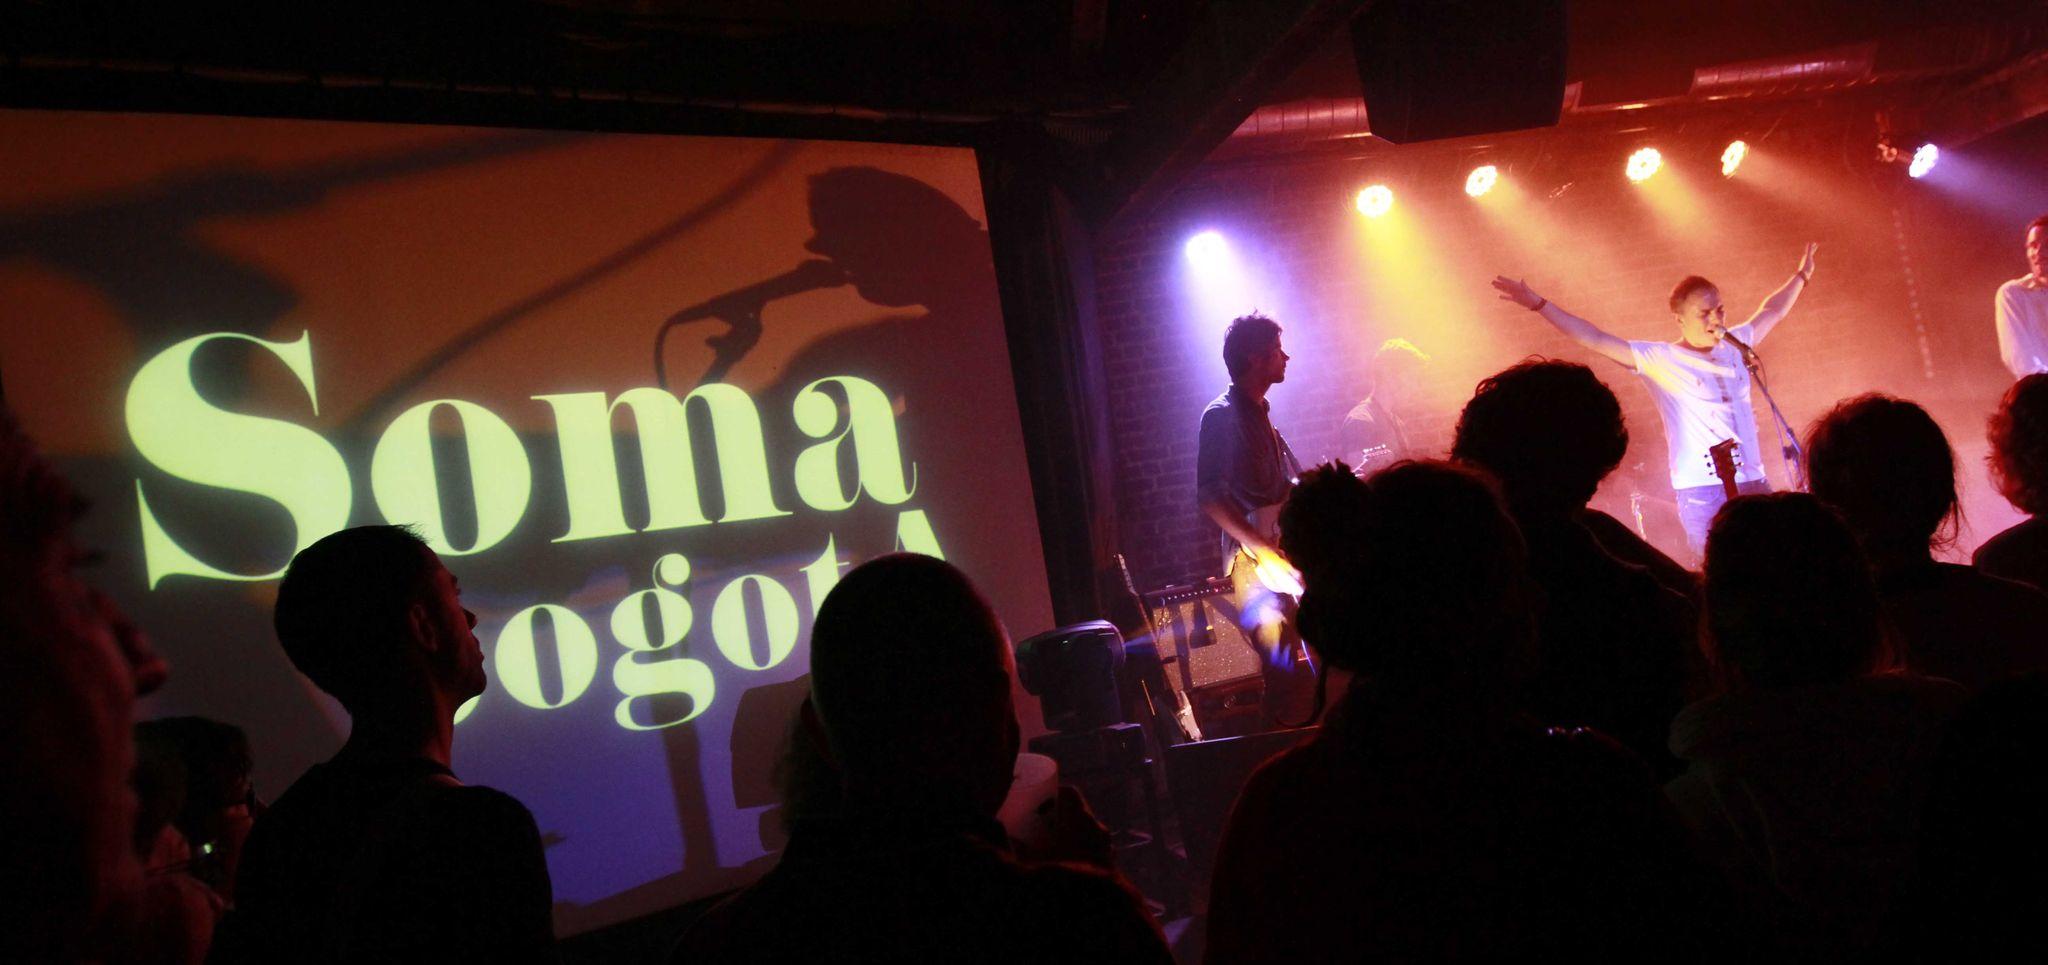 SomaBogota-ReleaseParty-MFW-2013-69